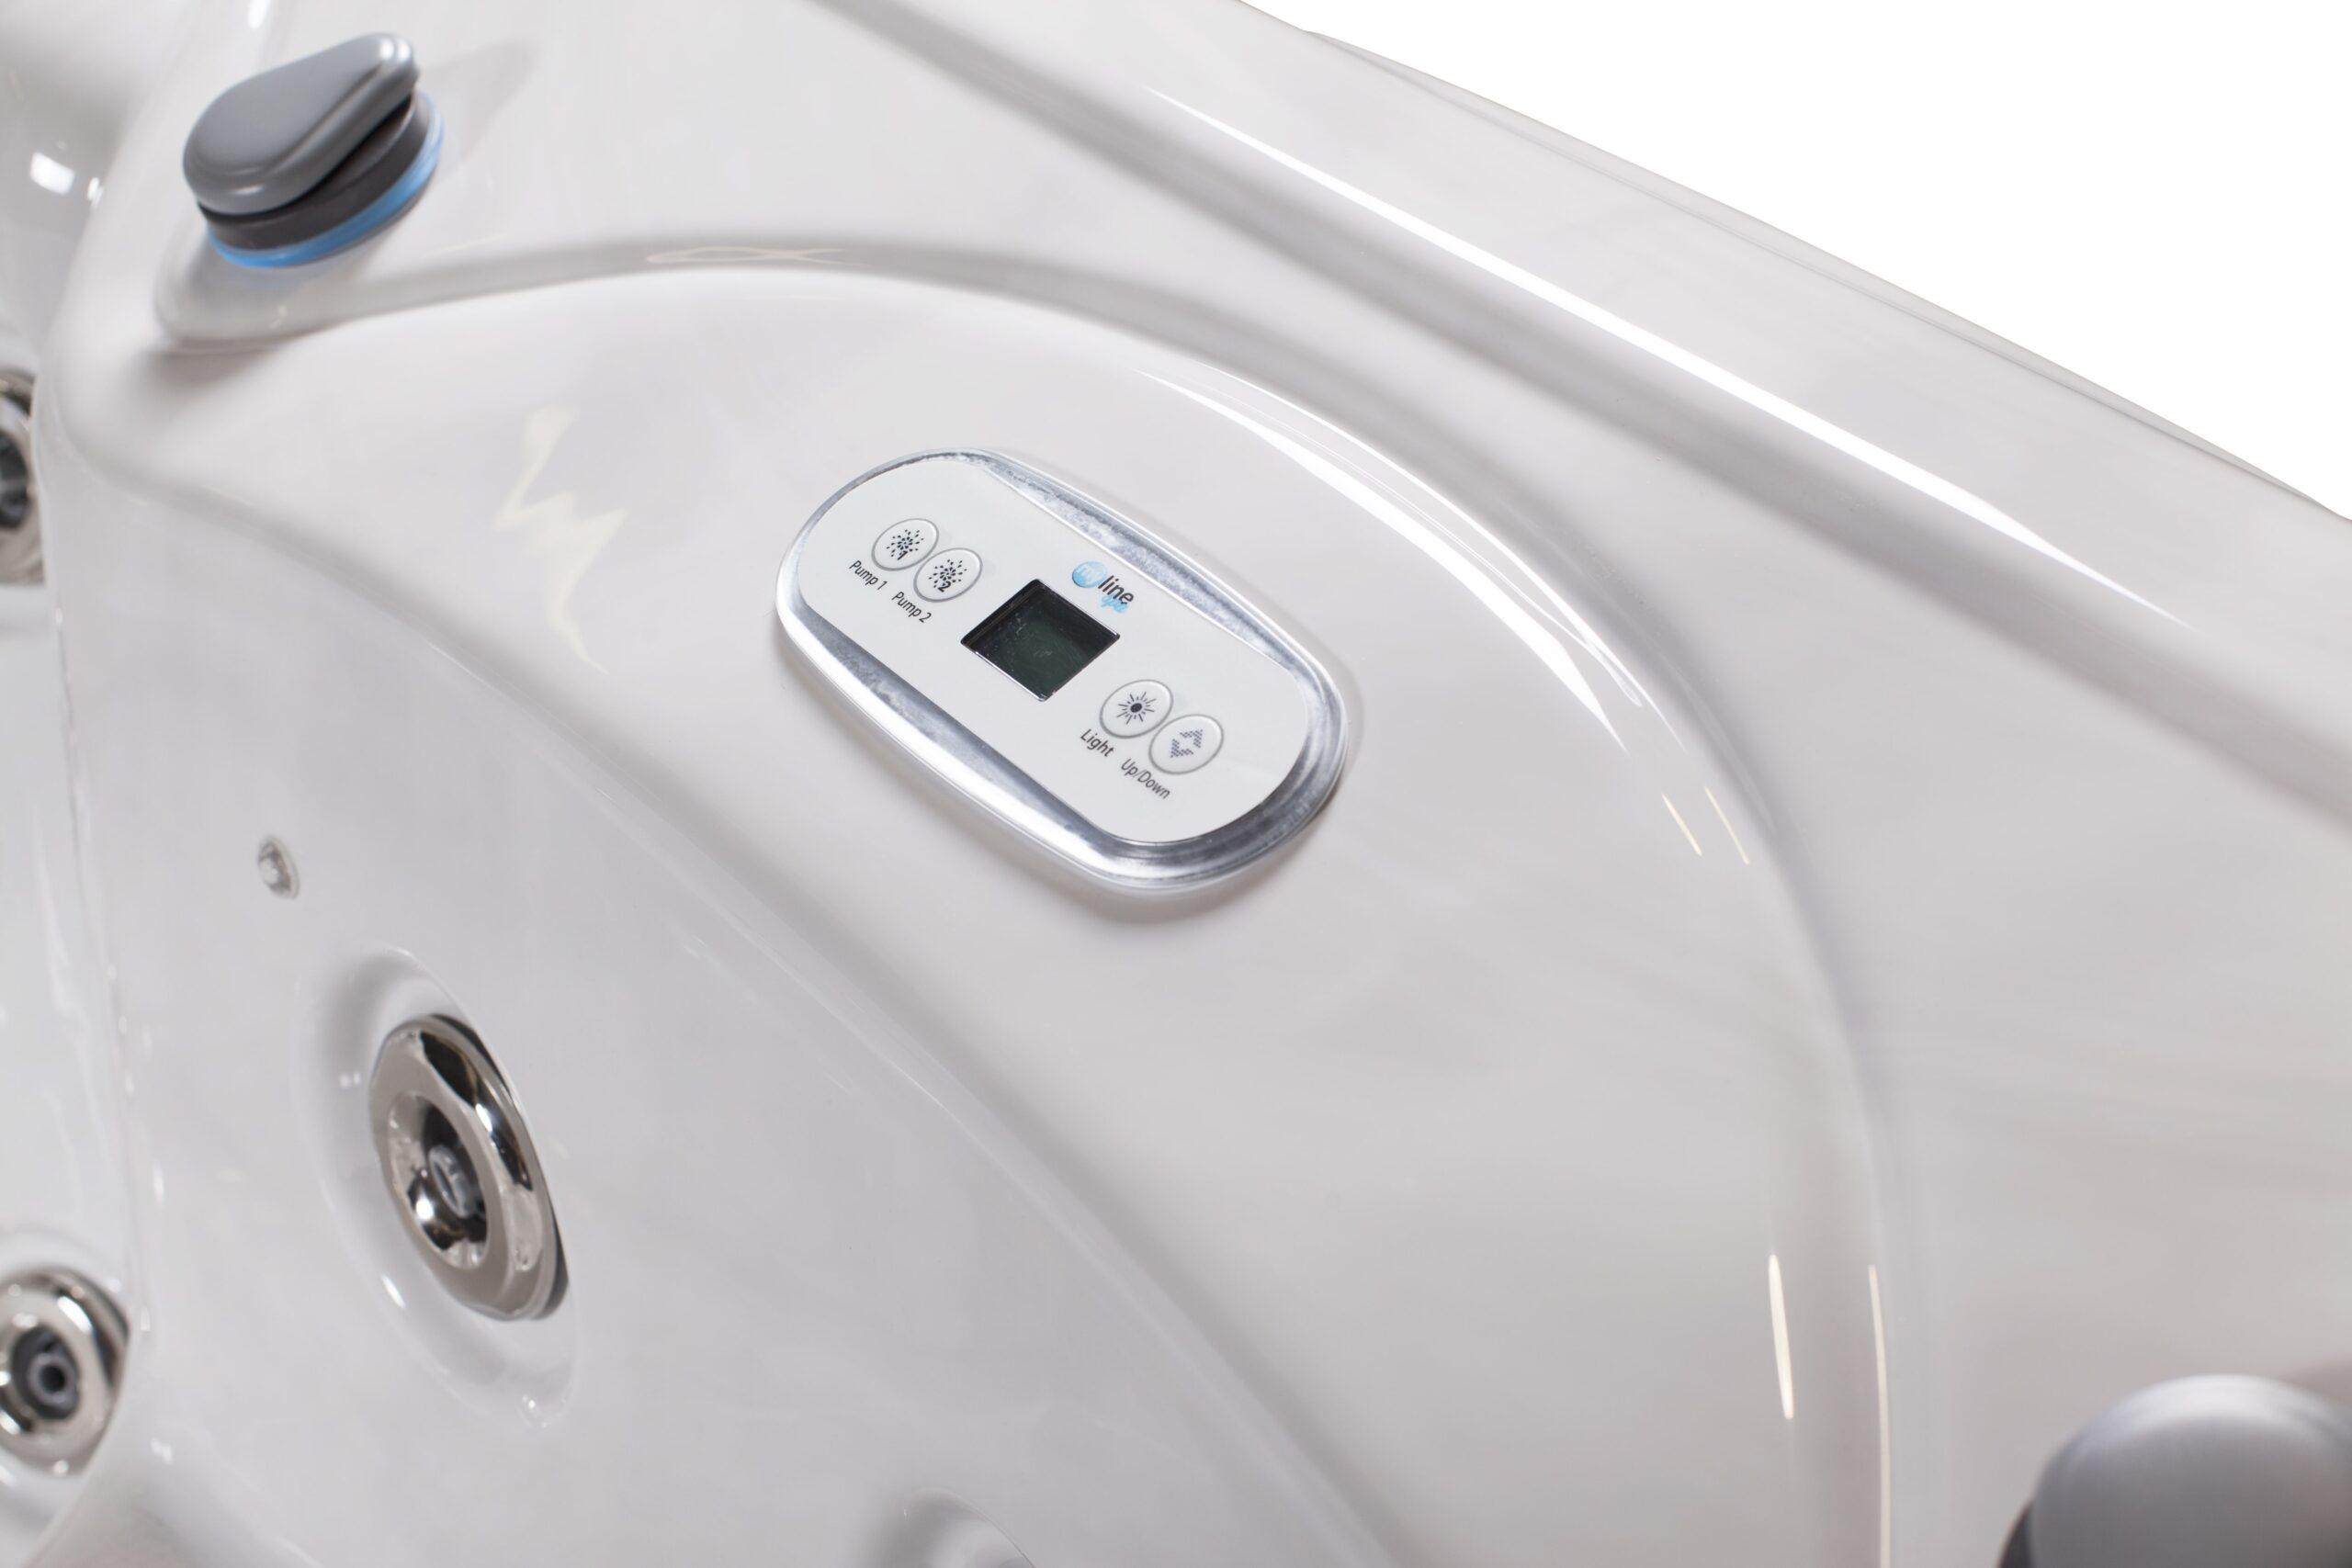 Myline Saturn hot tub